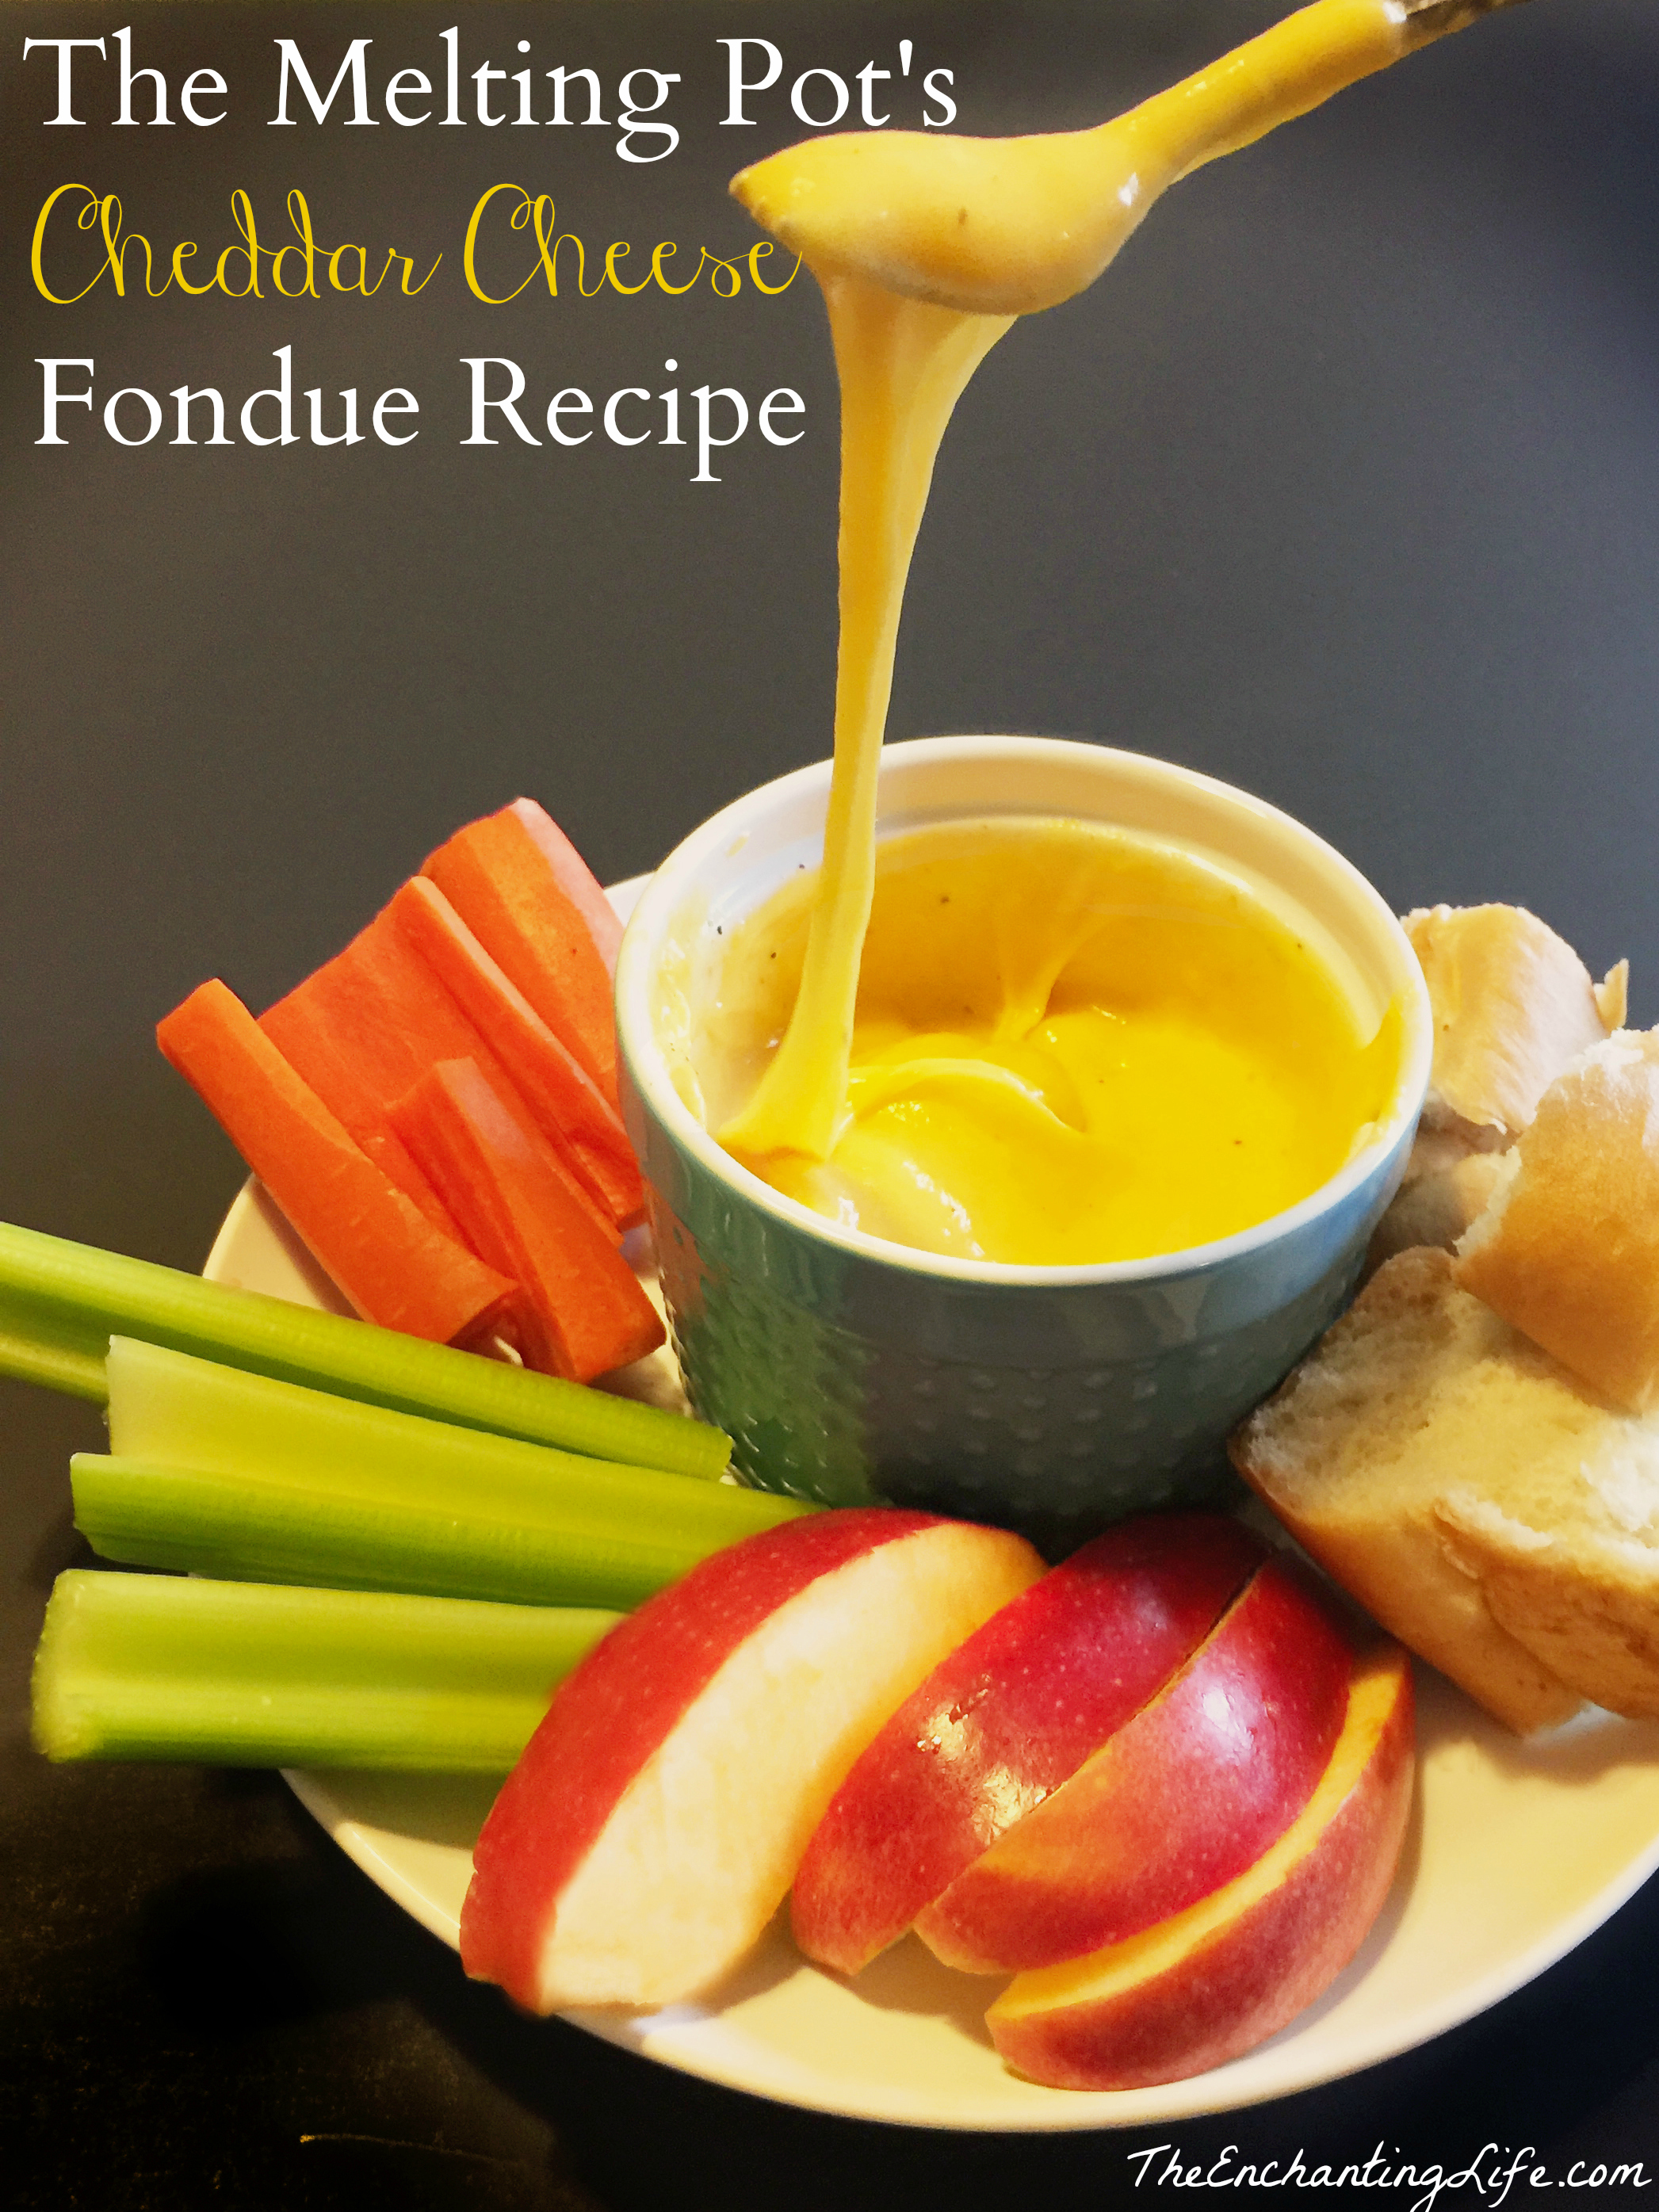 The Melting Pot S Cheddar Cheese Fondue Recipe